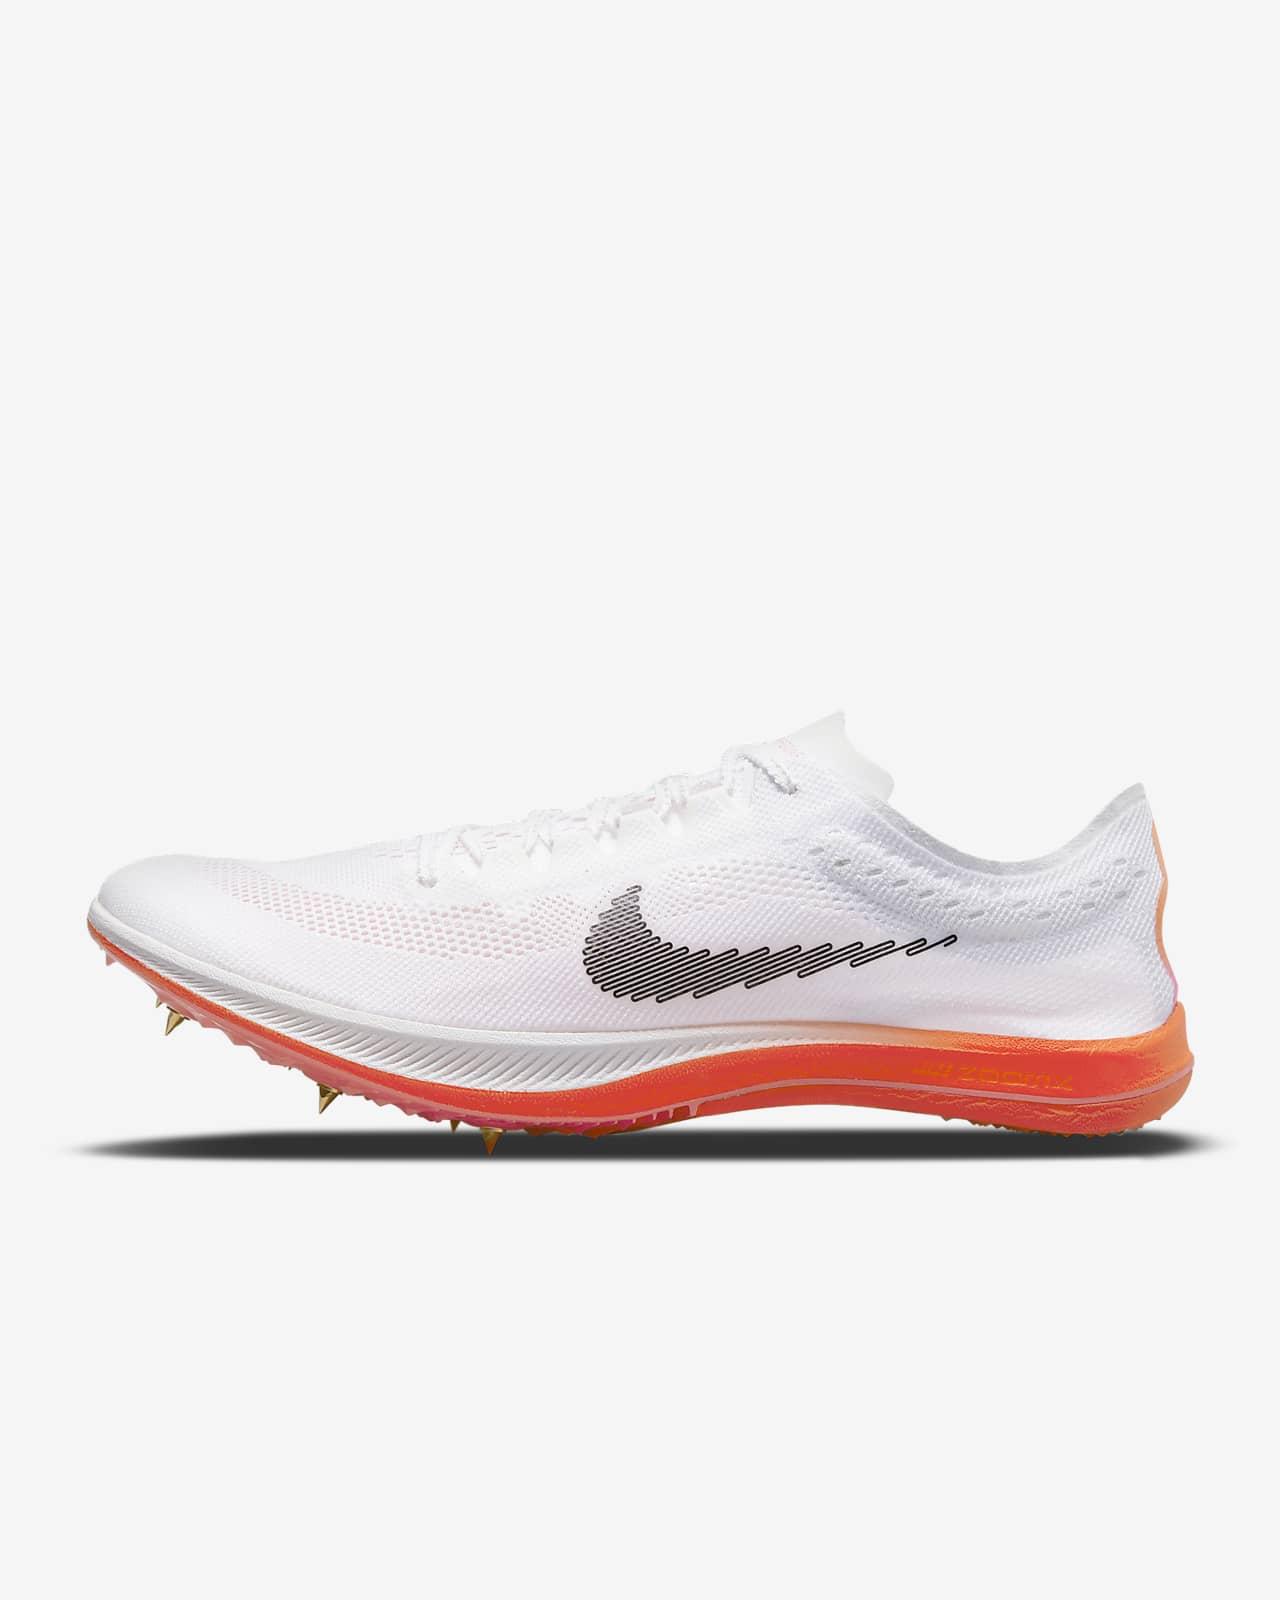 Chaussure de course à pointes Nike ZoomX Dragonfly